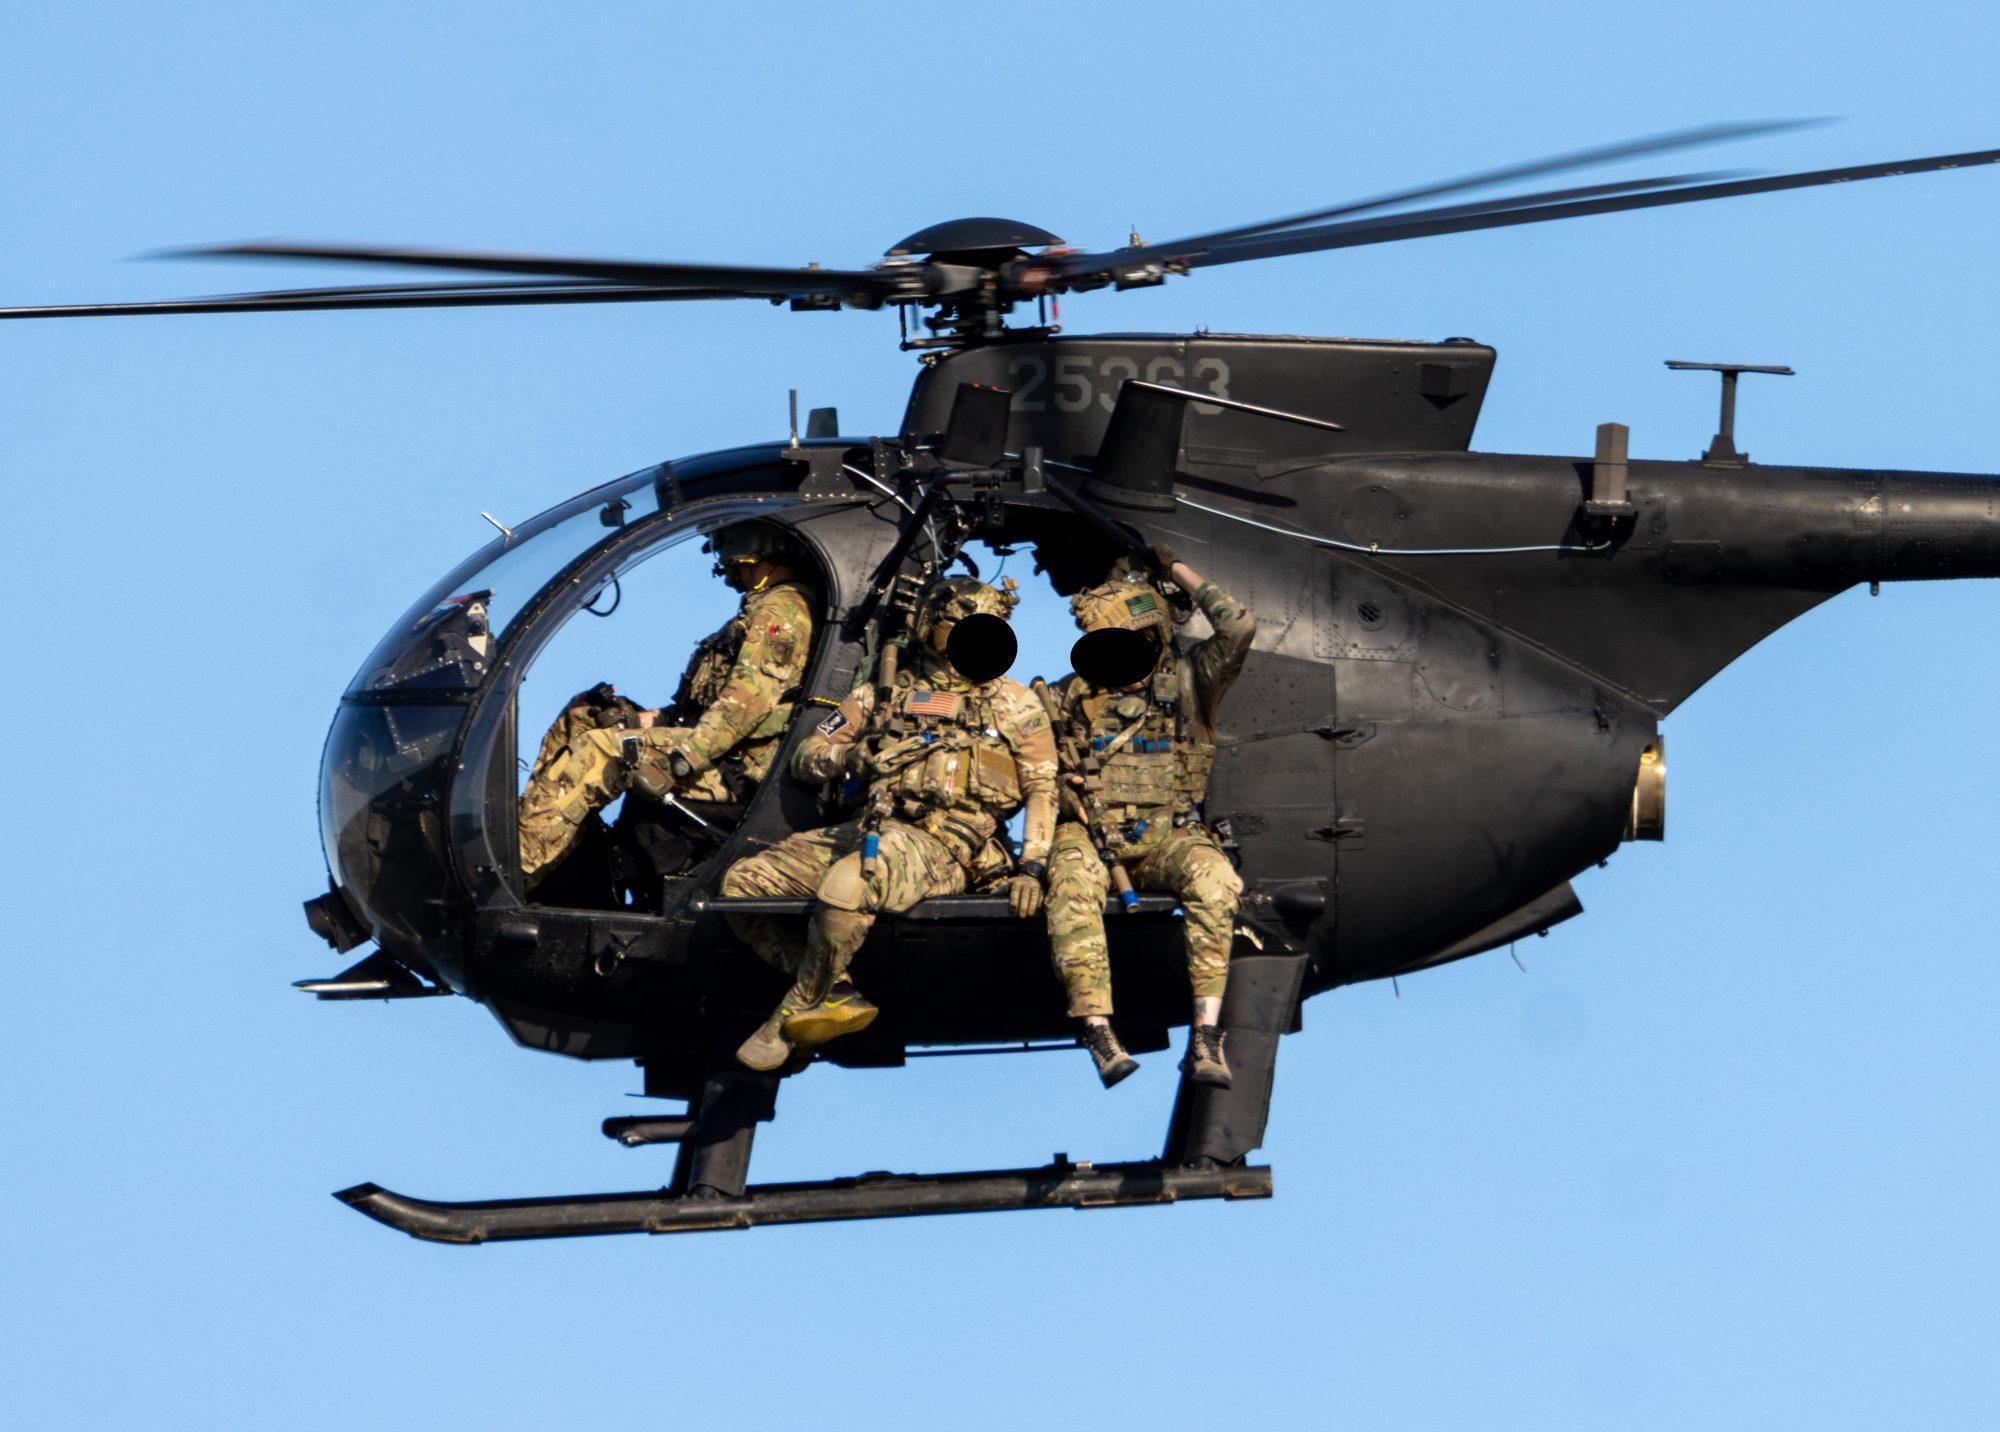 SEAL operators sitting on the planks of the Little Bird